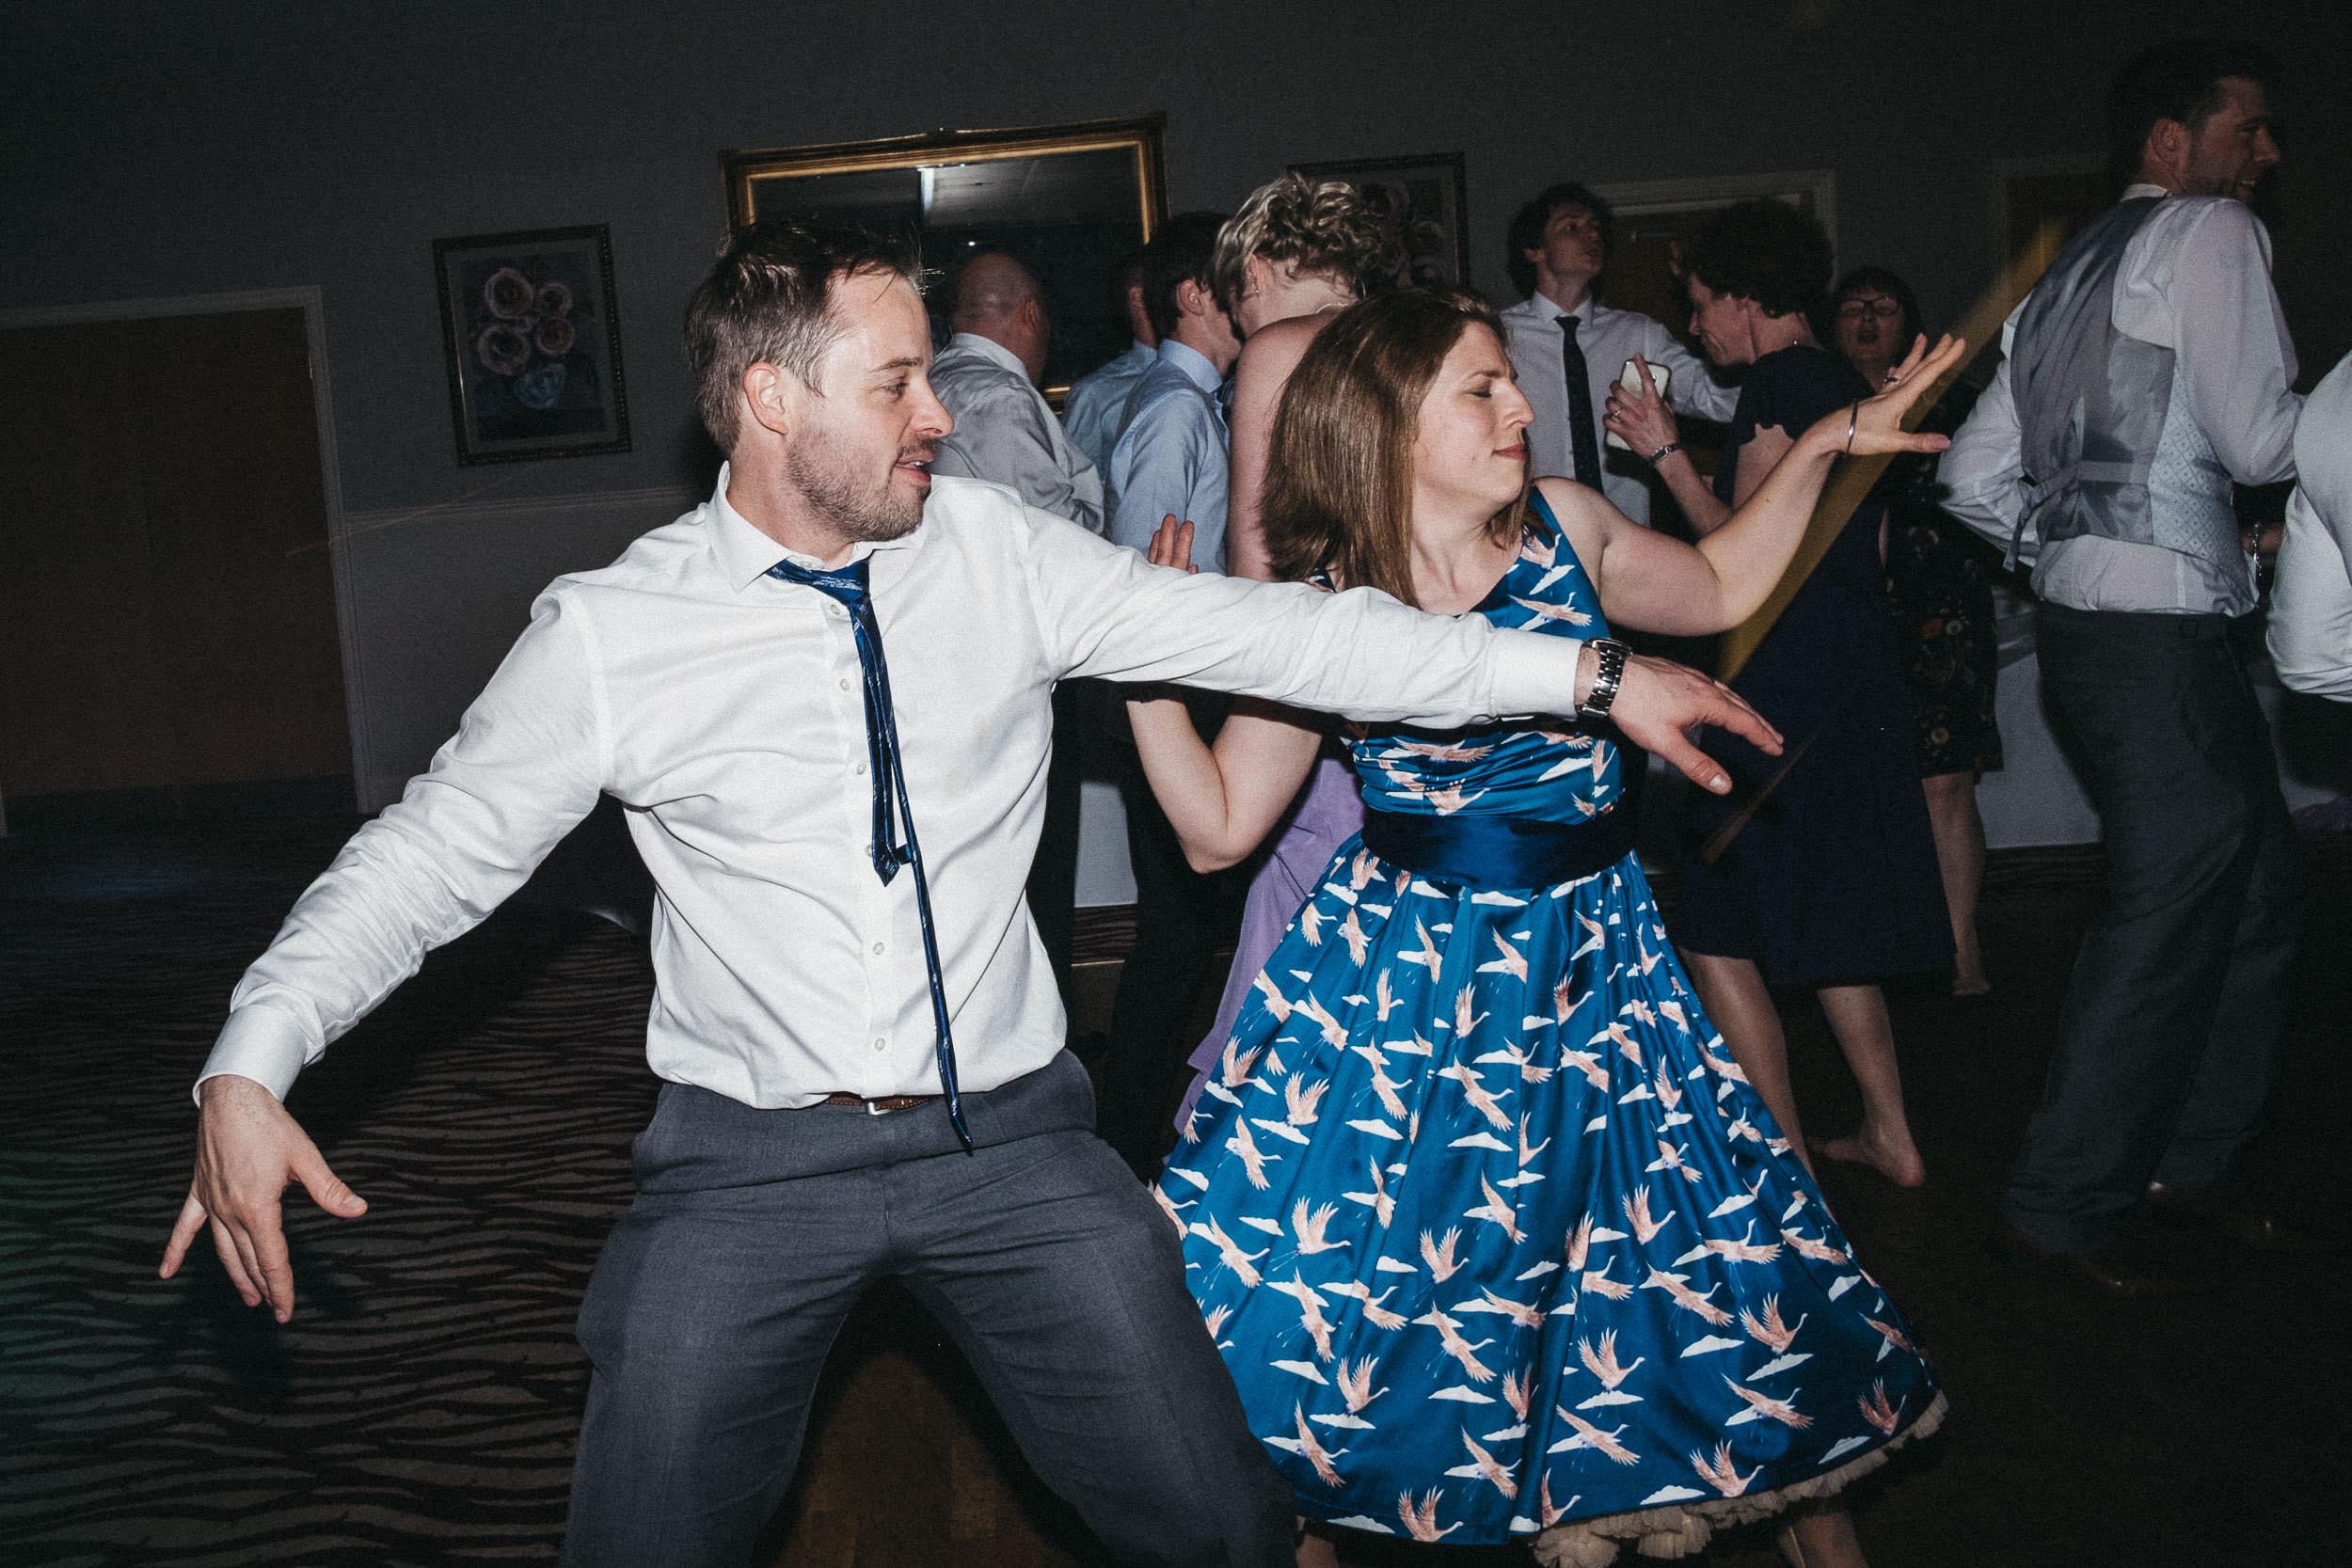 Wedding guests dancing in sync at Bagden Hall